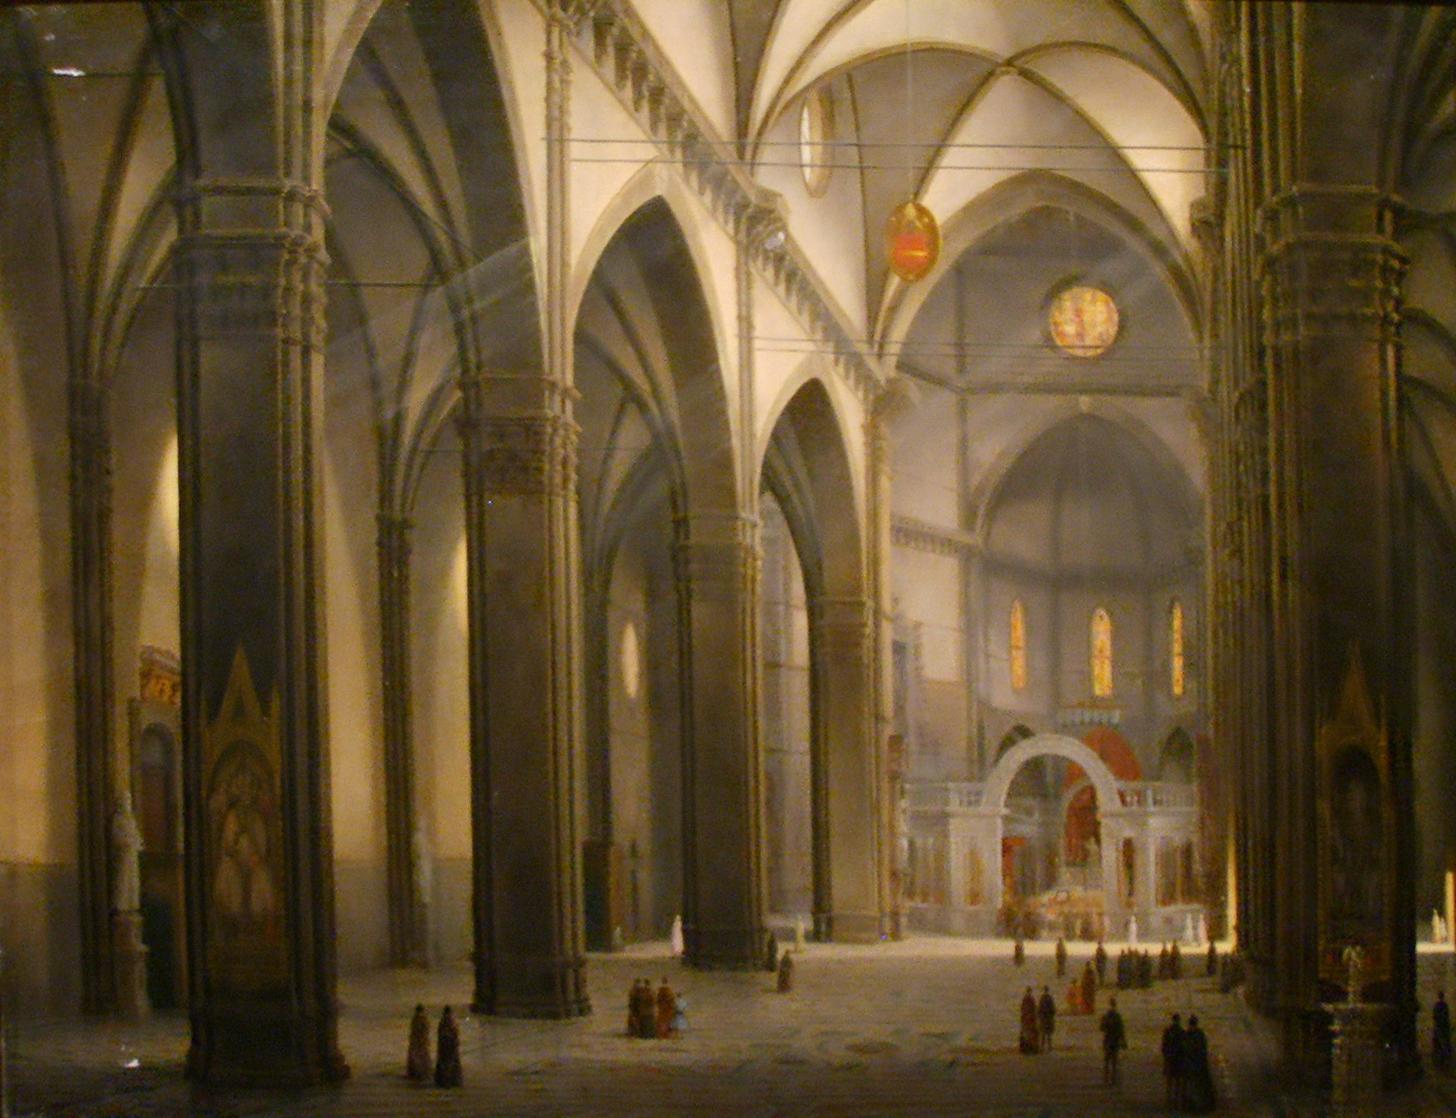 Fabio Borbottoni, Interior of the Duomo of Florence, ca. 1902.